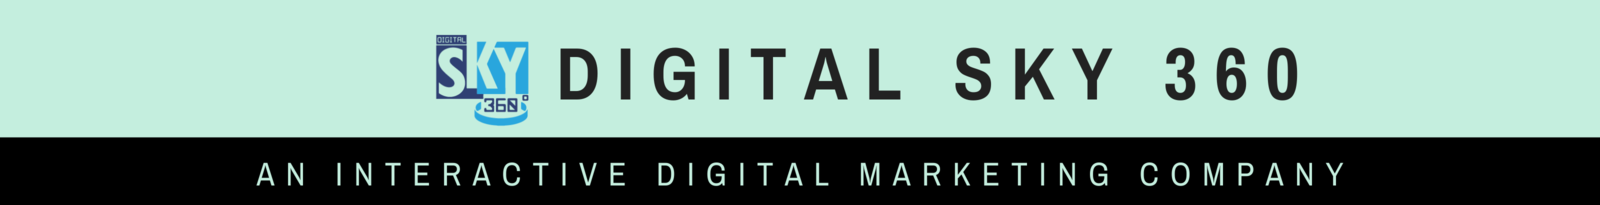 Digital sky 360 - digital marketing company ahmedabad